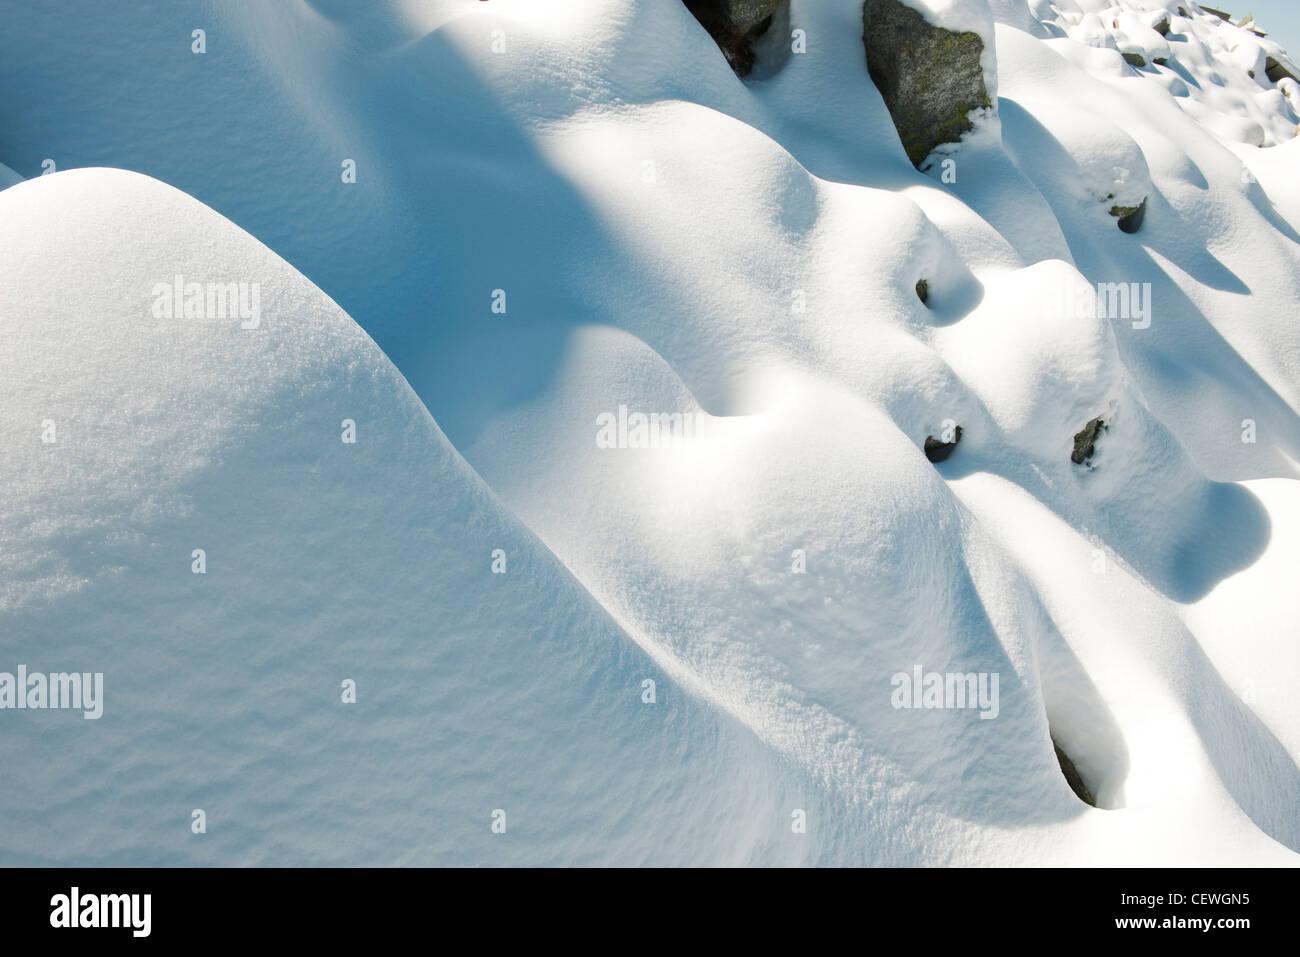 Snow mounds, full frame - Stock Image